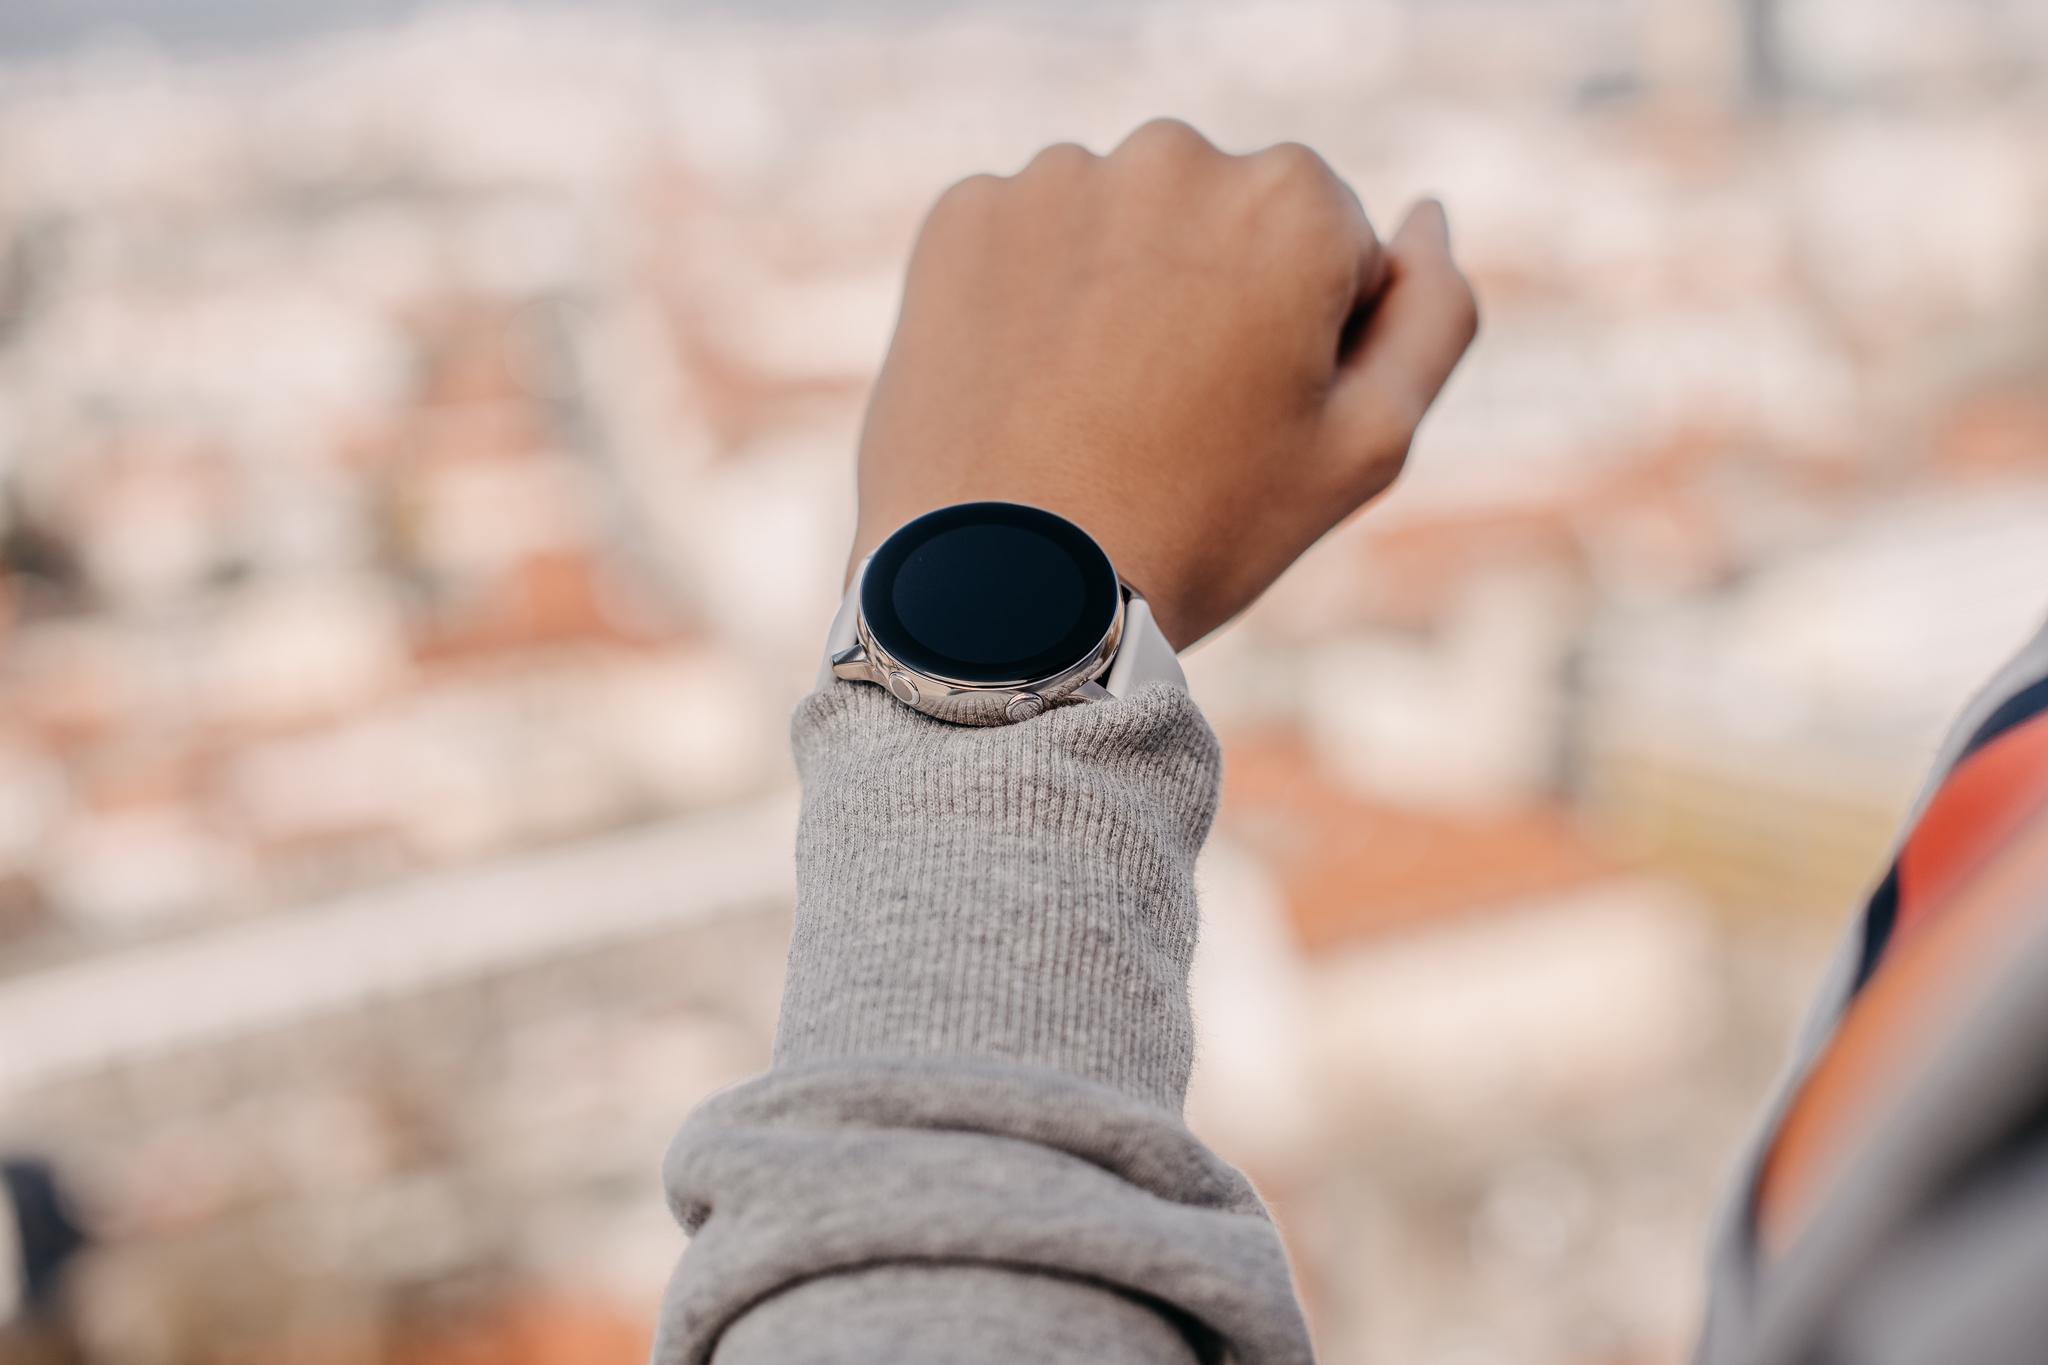 Čudovita ura Samsung Galaxy Watch Active podpira brezžično polnjenje Qi.